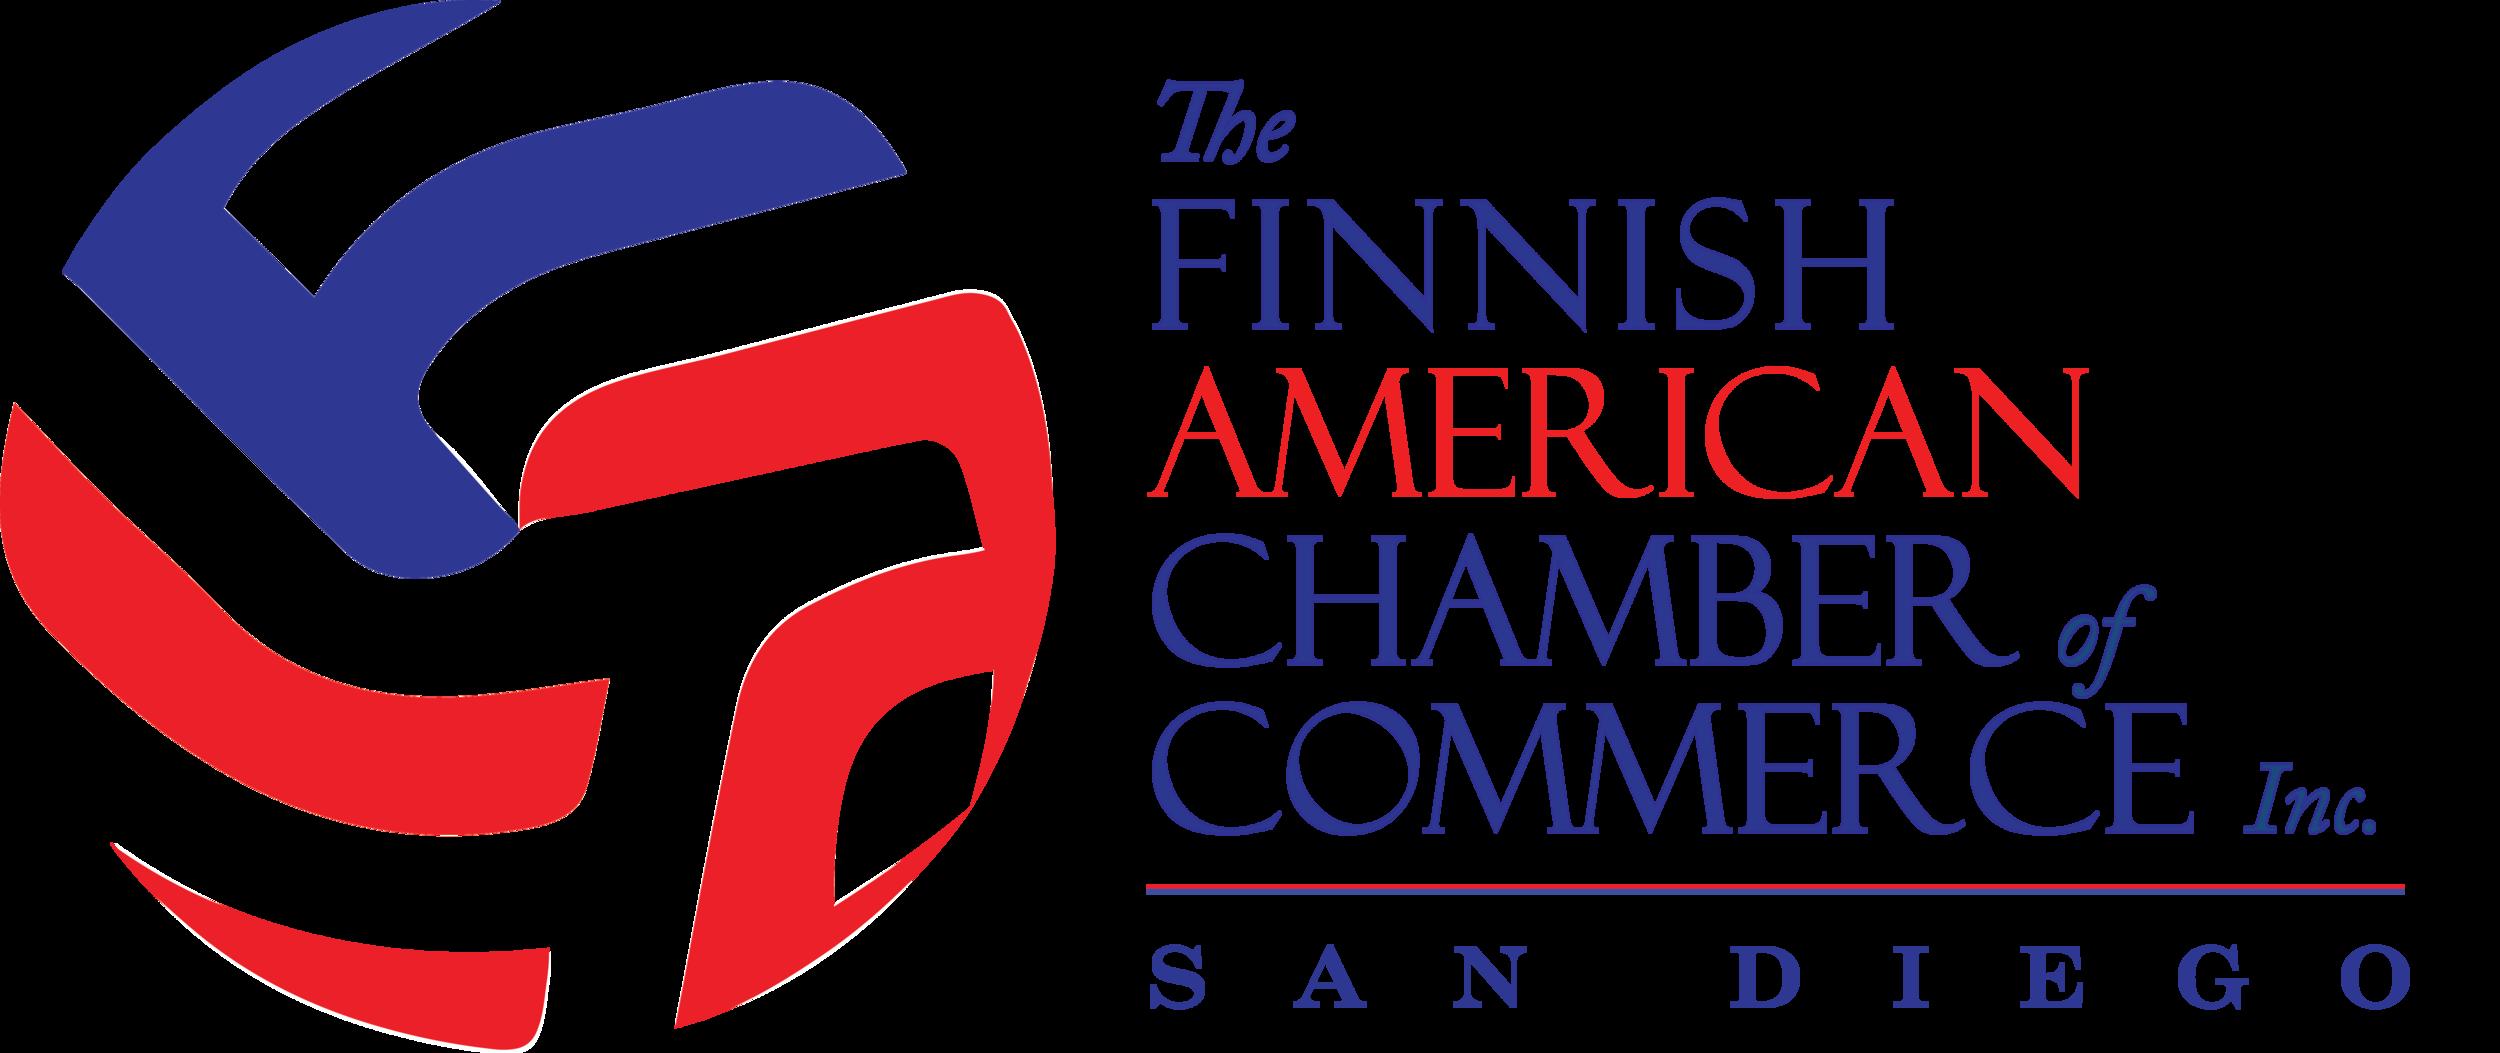 FACC-logo-transparent-background.png